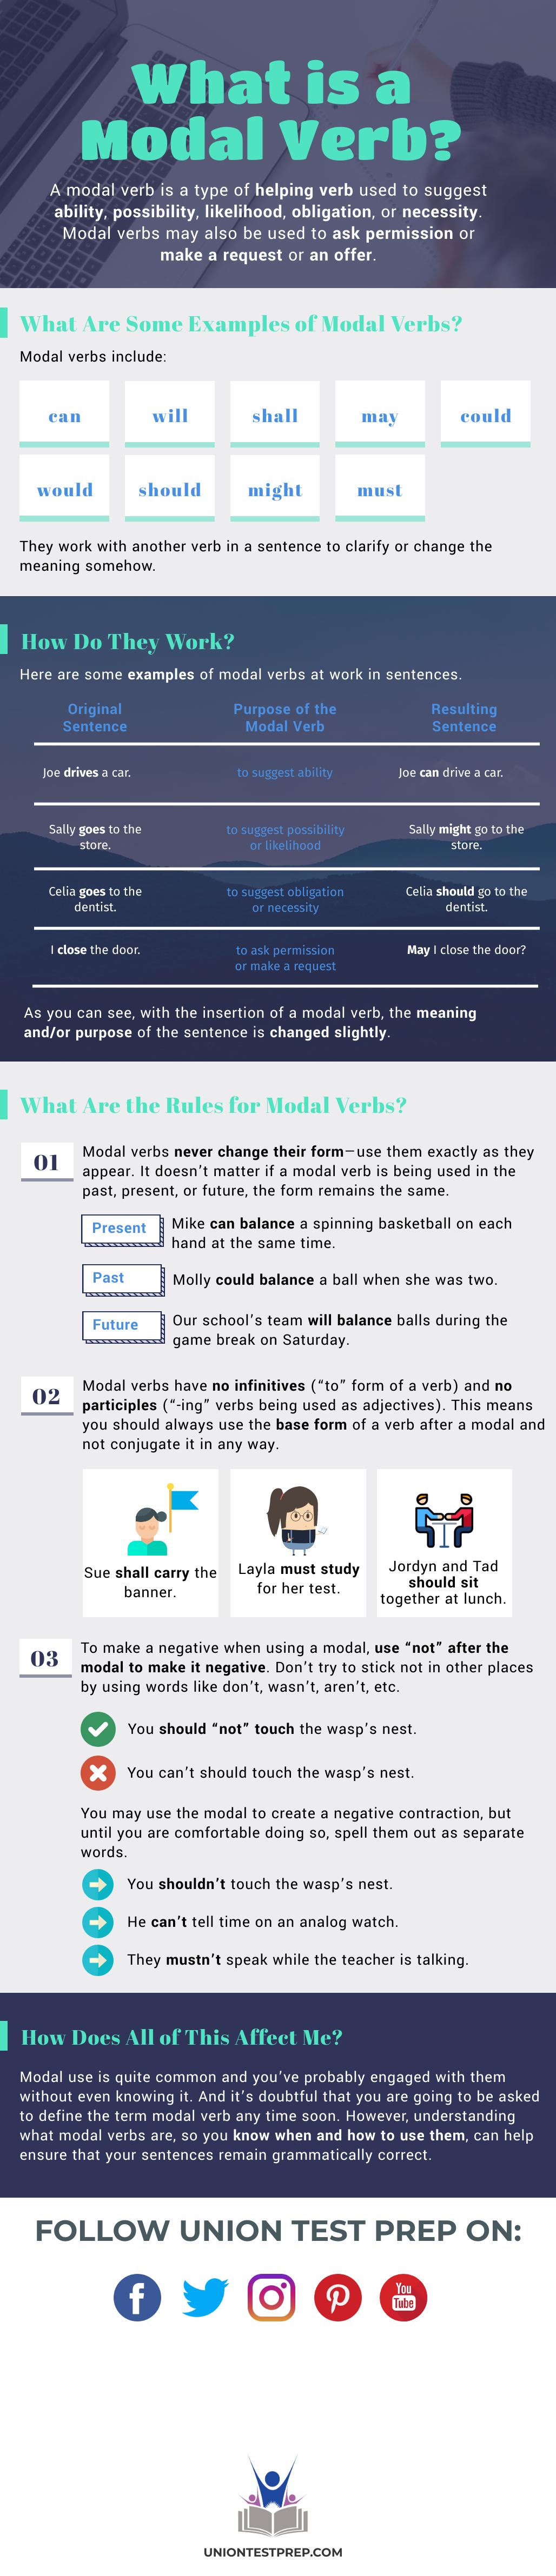 what is a modal verb